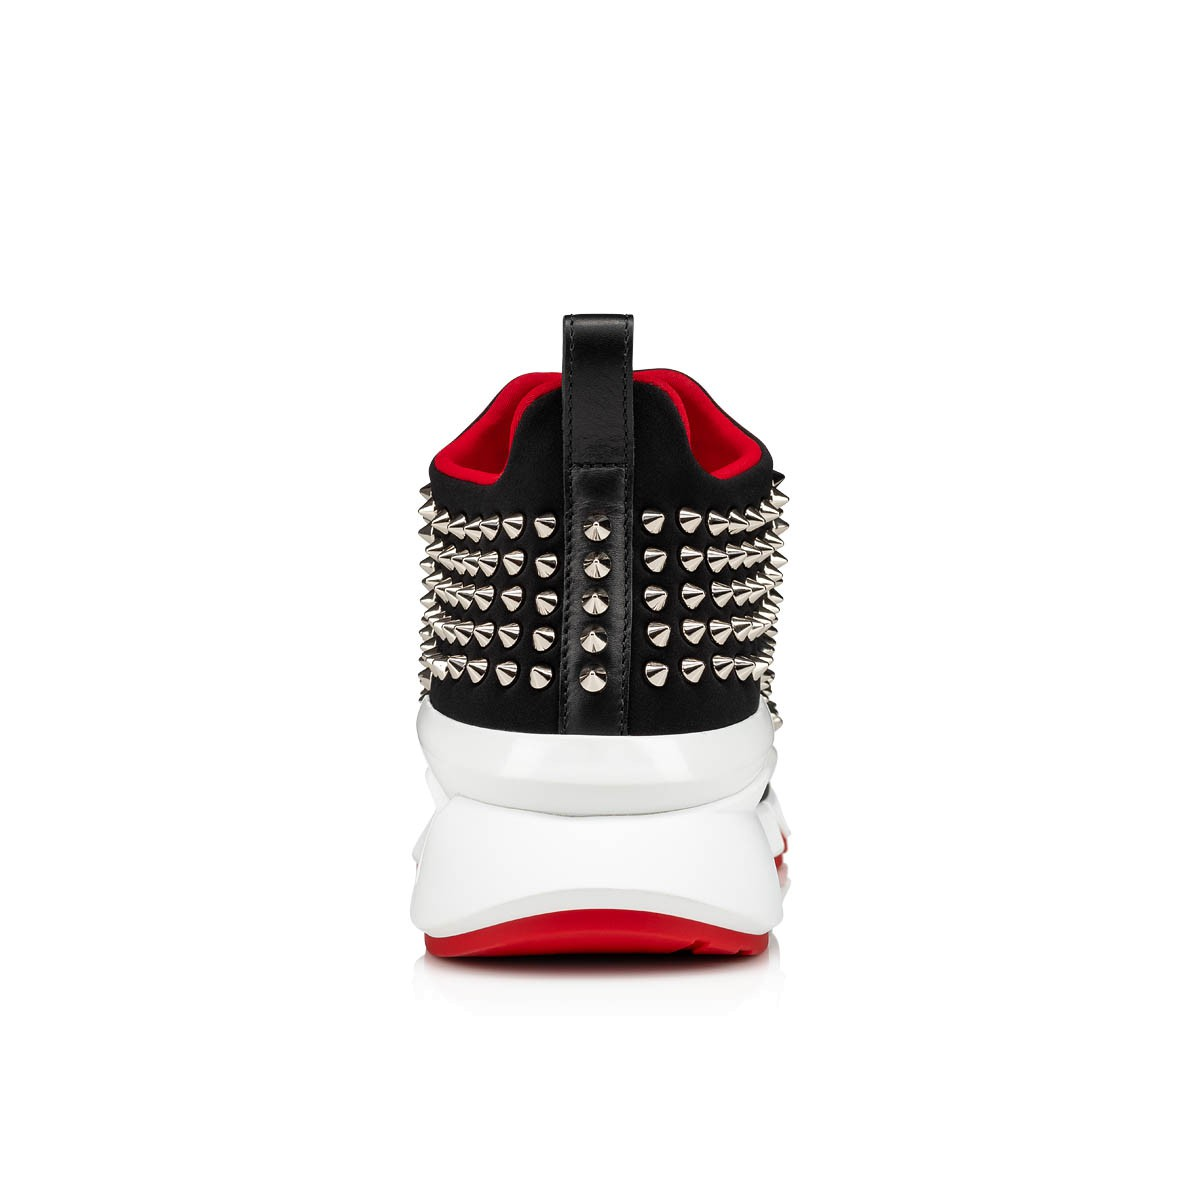 Shoes - Spike Sock Donna - Christian Louboutin